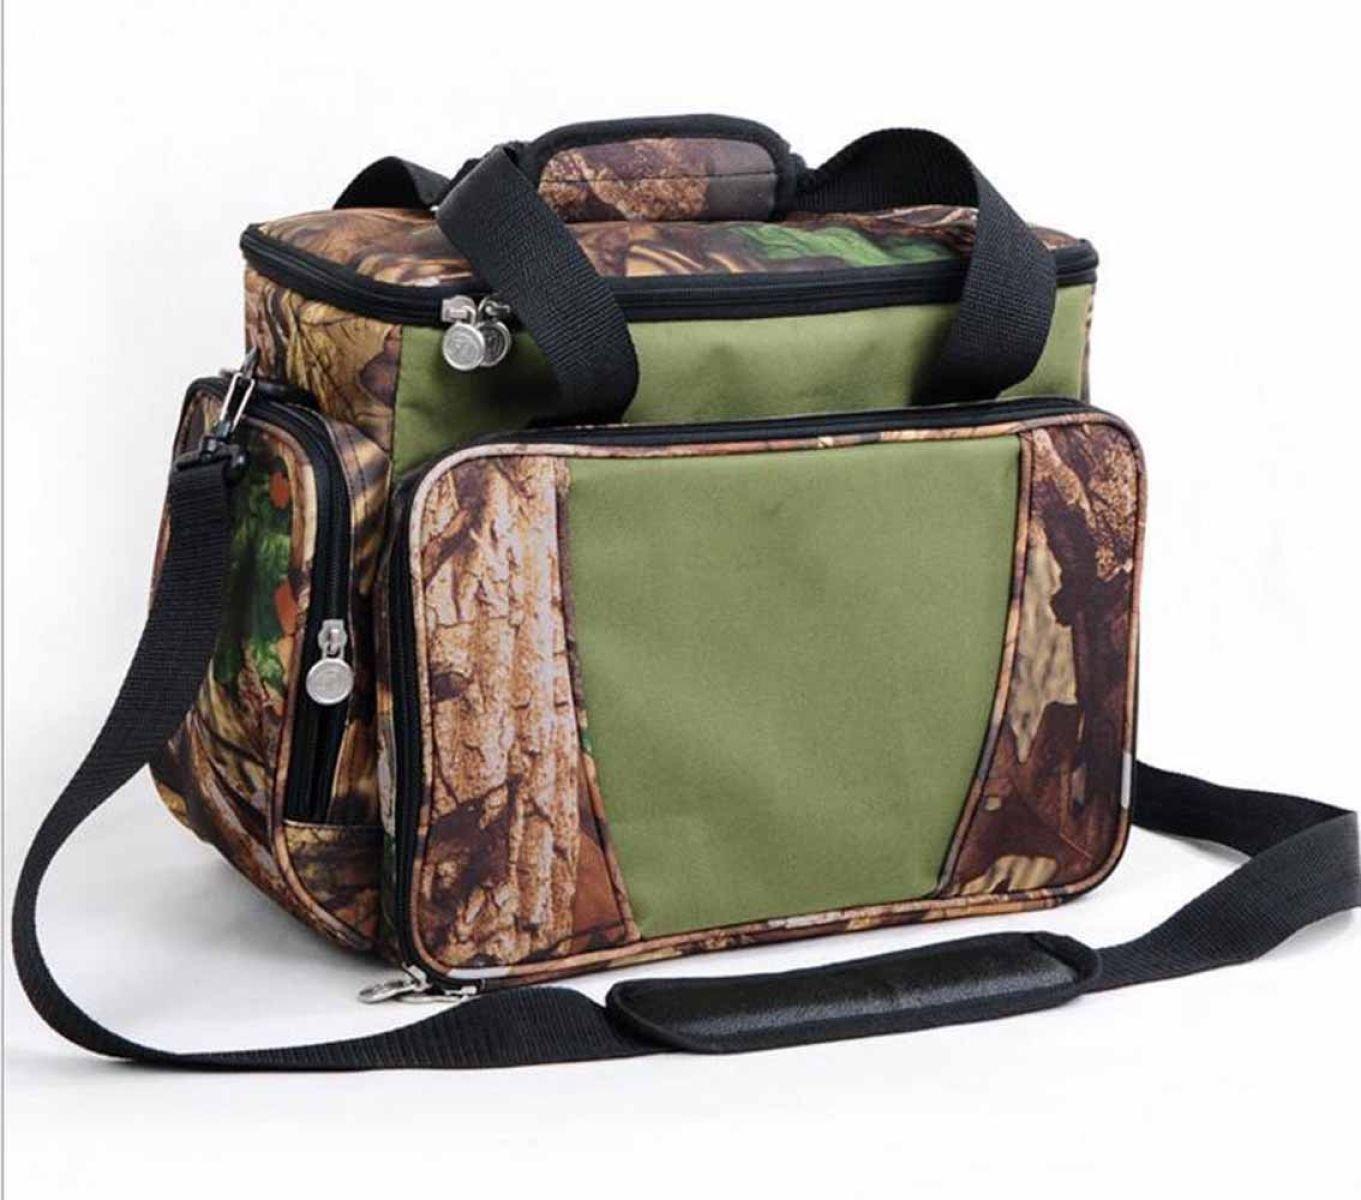 Outdoor-Picknick-Kühltasche Kühltasche Tragbar Tasche Handtasche